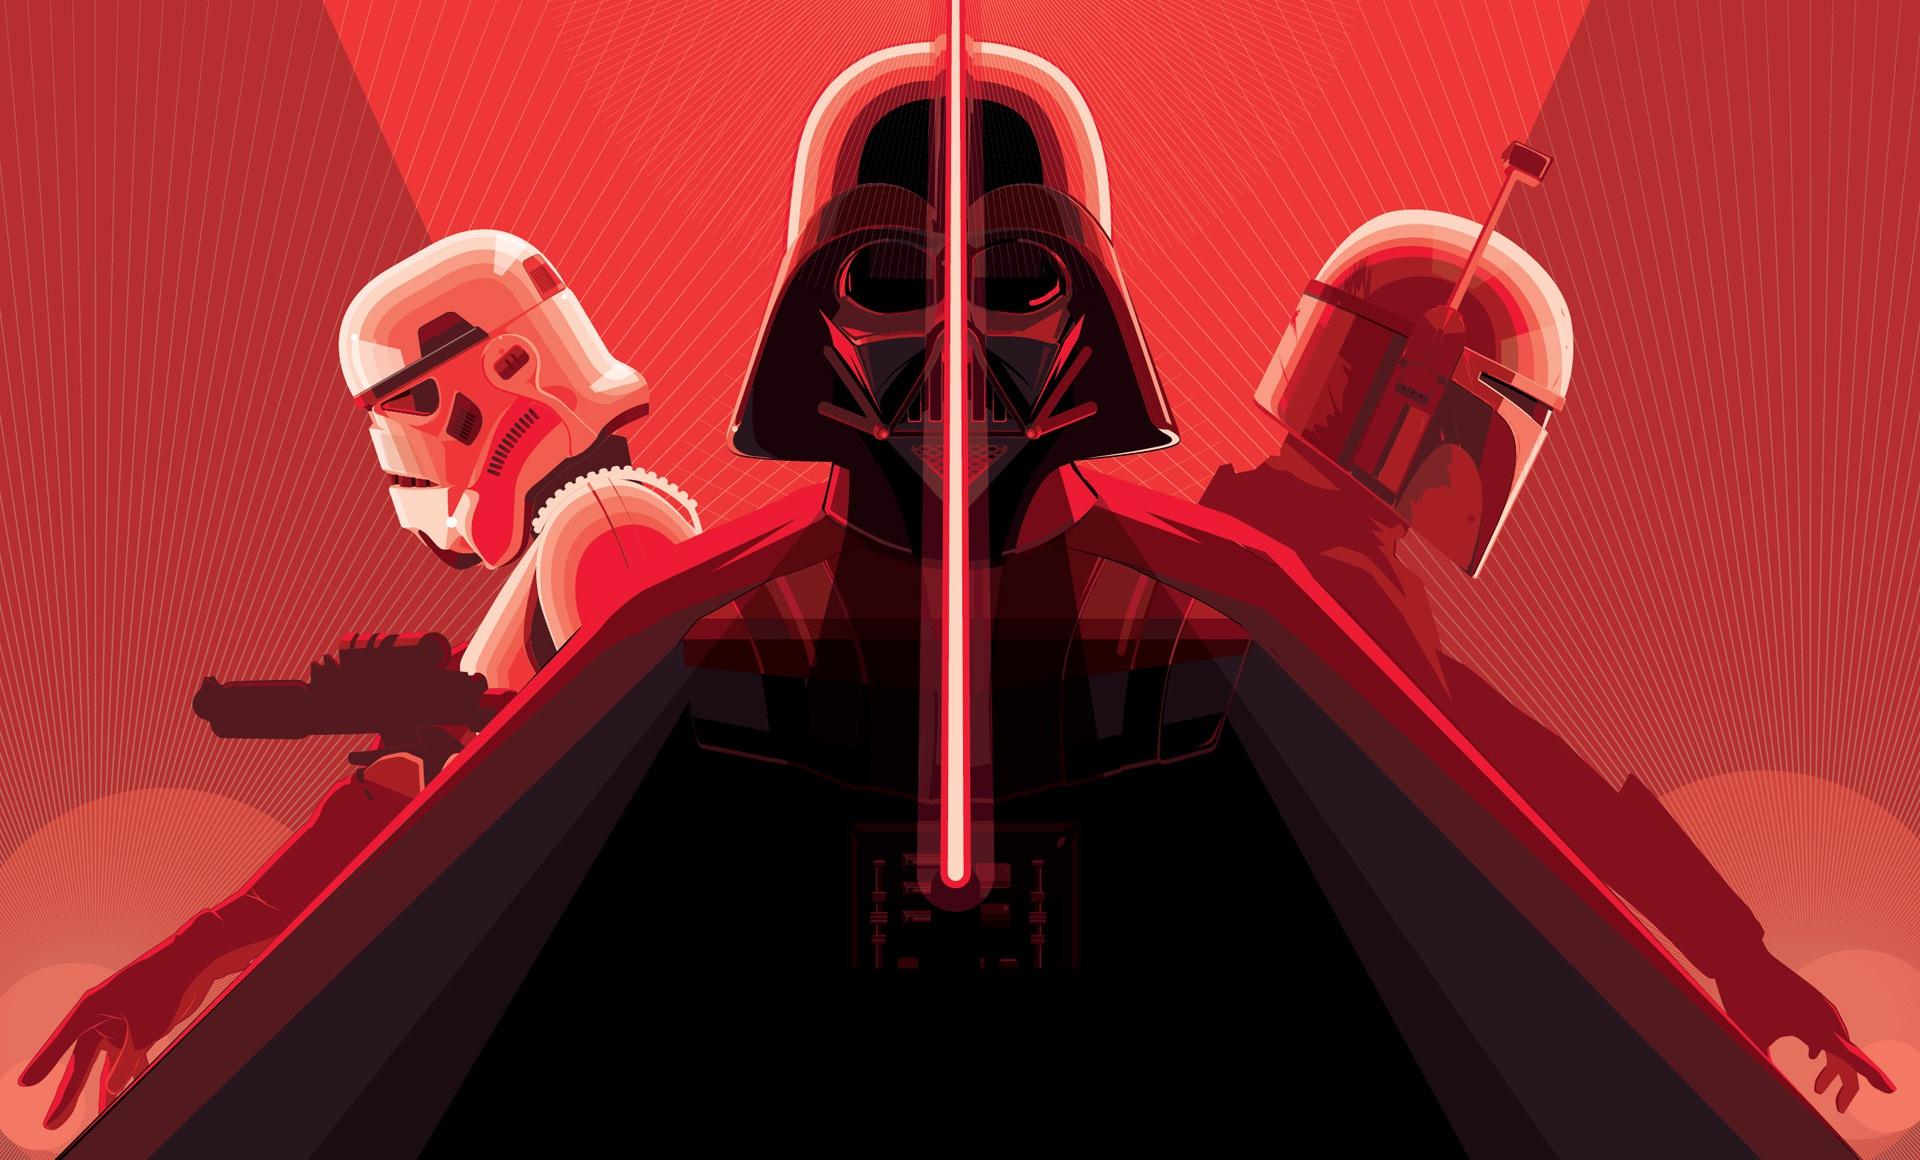 Star Wars Hd Wallpaper Background Image 1920x1160 Id 969634 Wallpaper Abyss